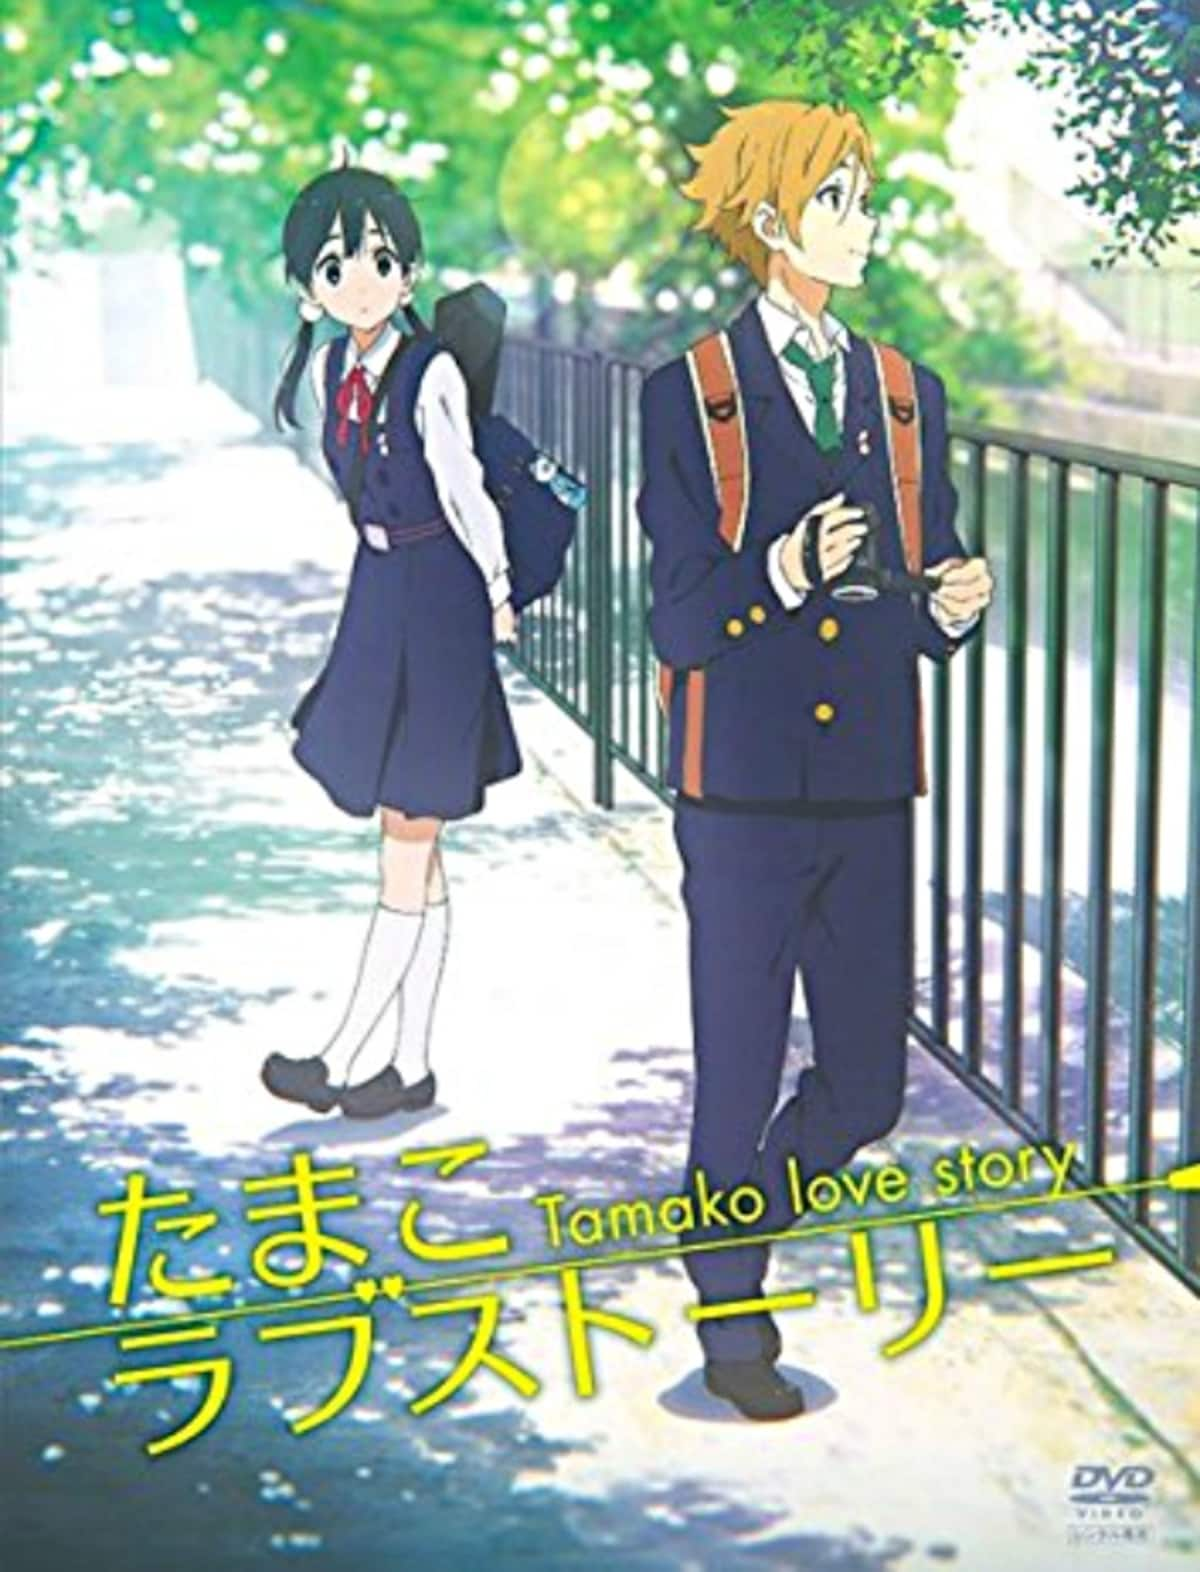 5 Tamako Love Story